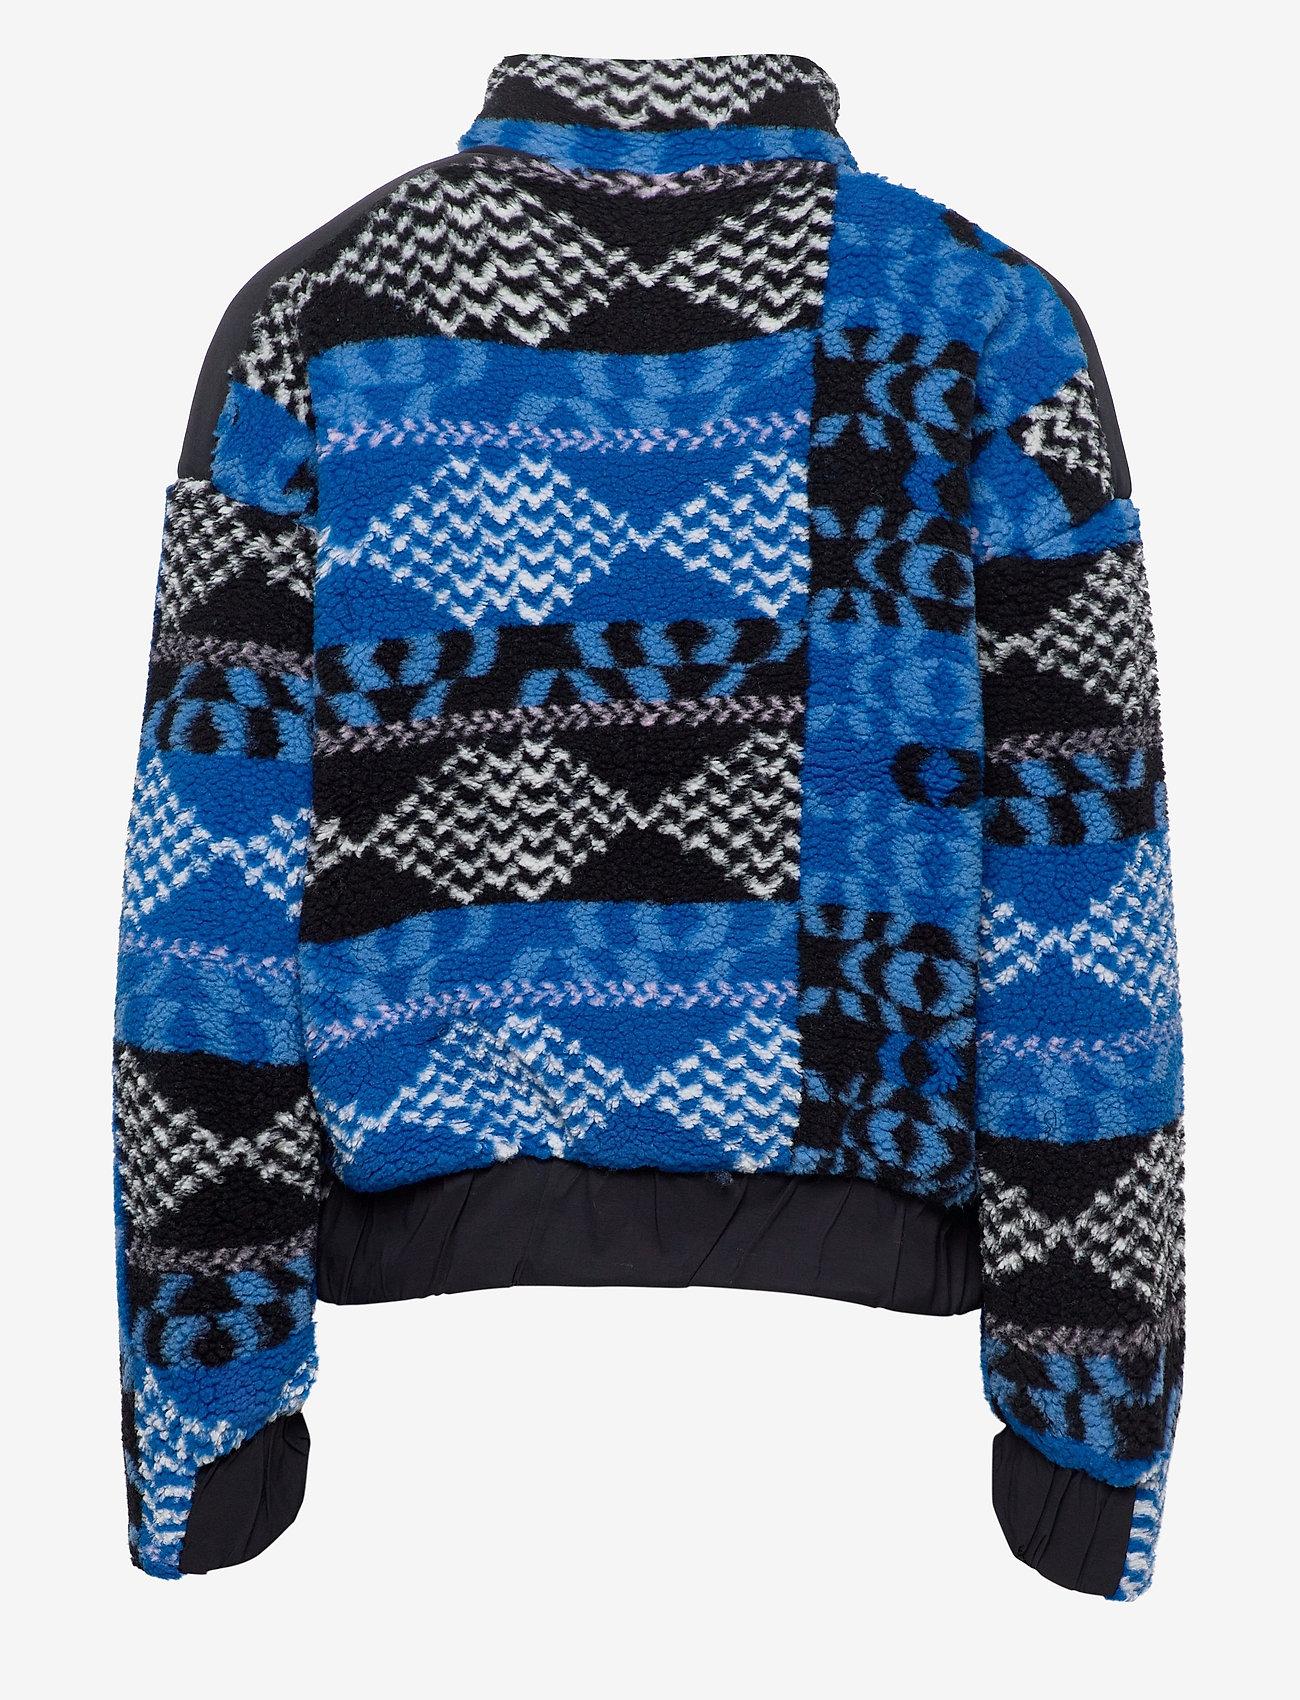 Peak Performance - W Original Pile Zip AW Pattern - fleece - pattern - 1